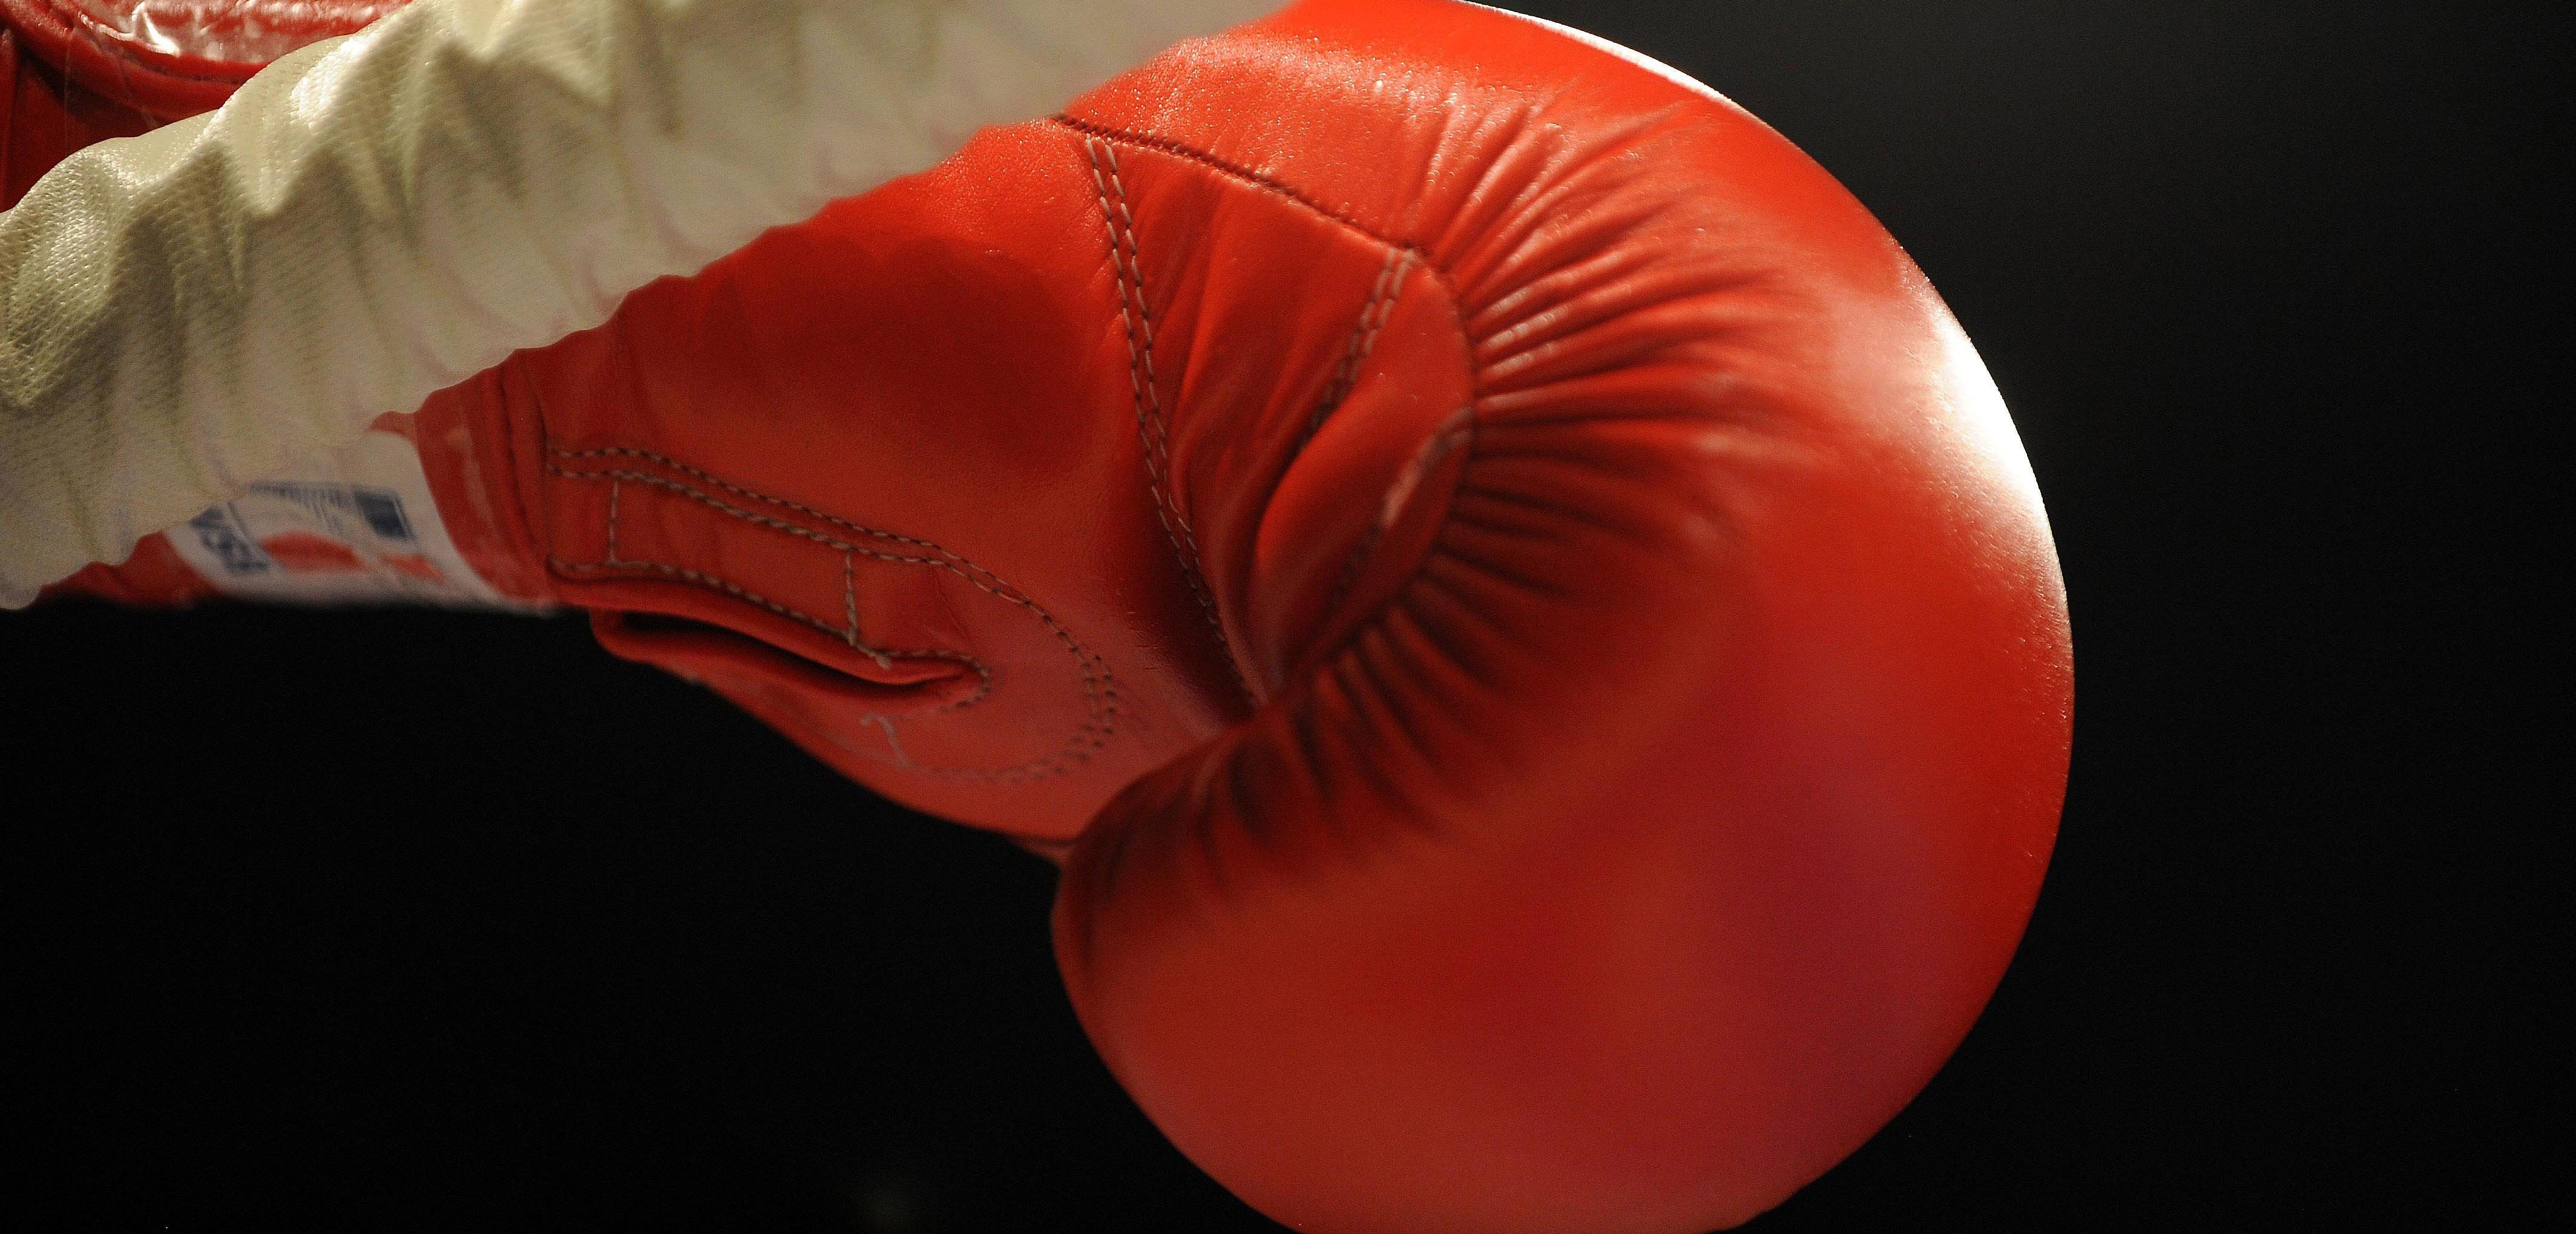 Les-gants-du-légendaire-Mohamed-Ali-mis-en-vente